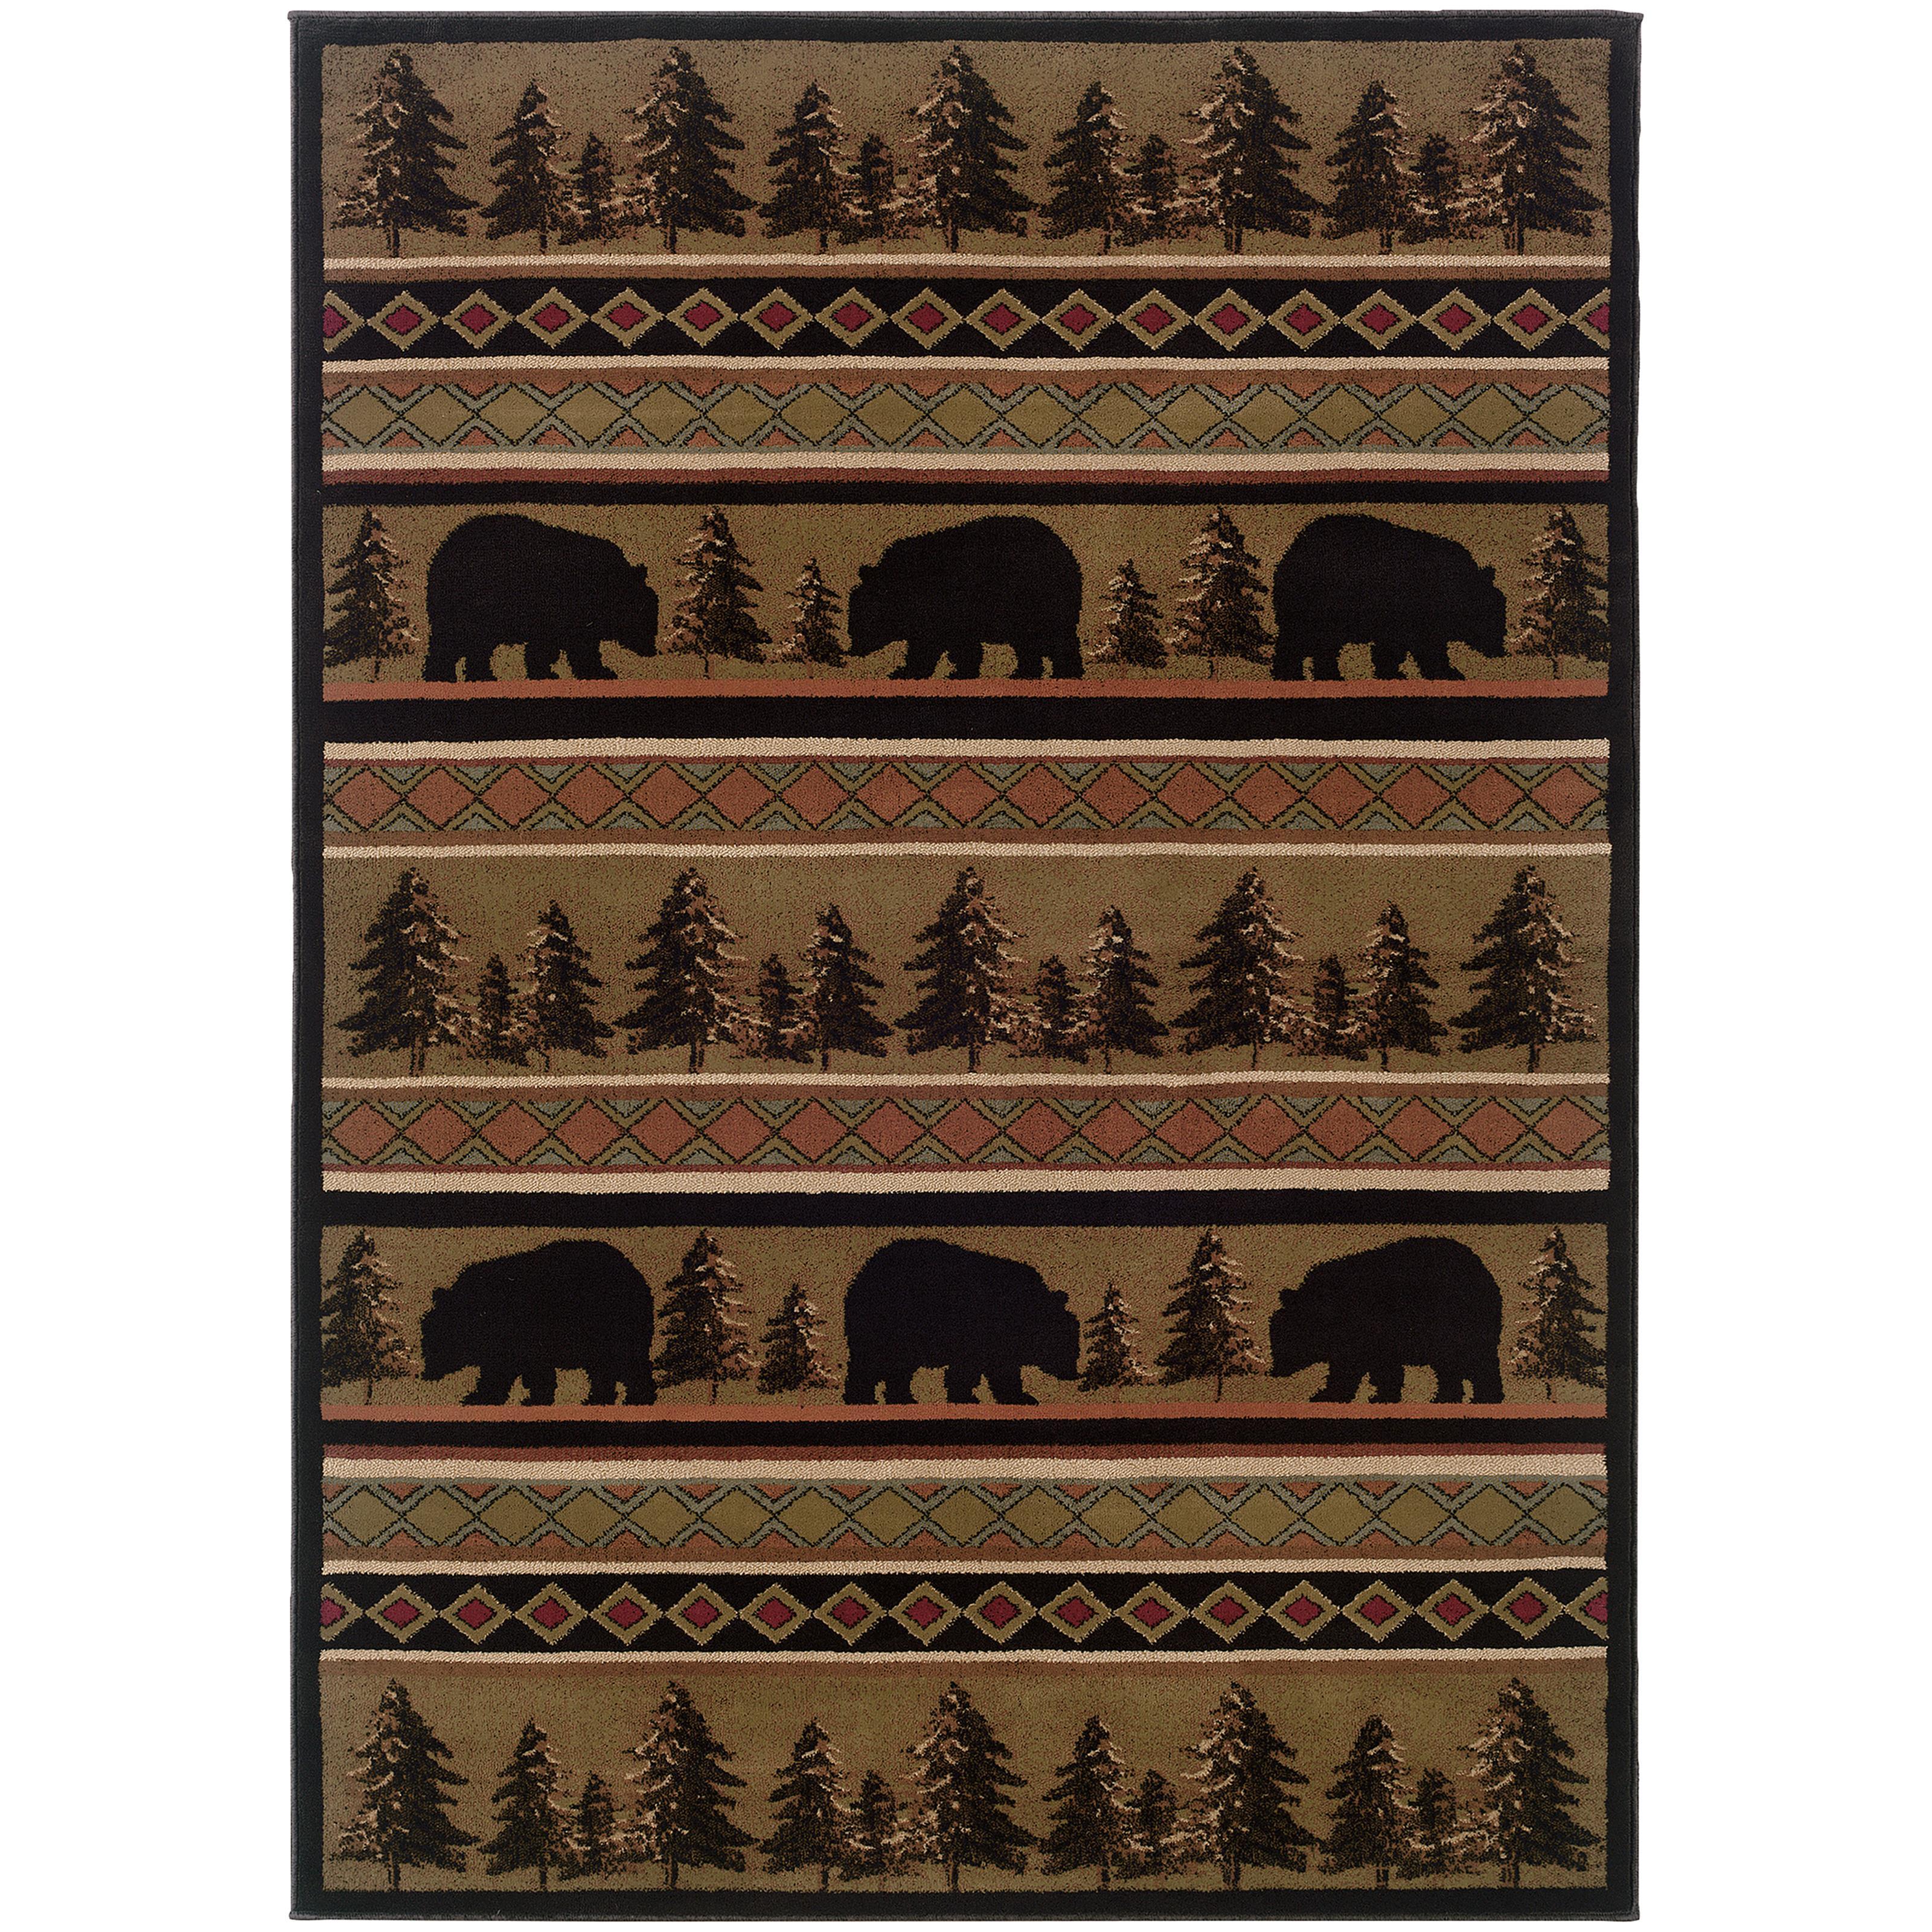 Oriental Weavers Hudson 10' X 13' Rug - Item Number: H1066A305396ST